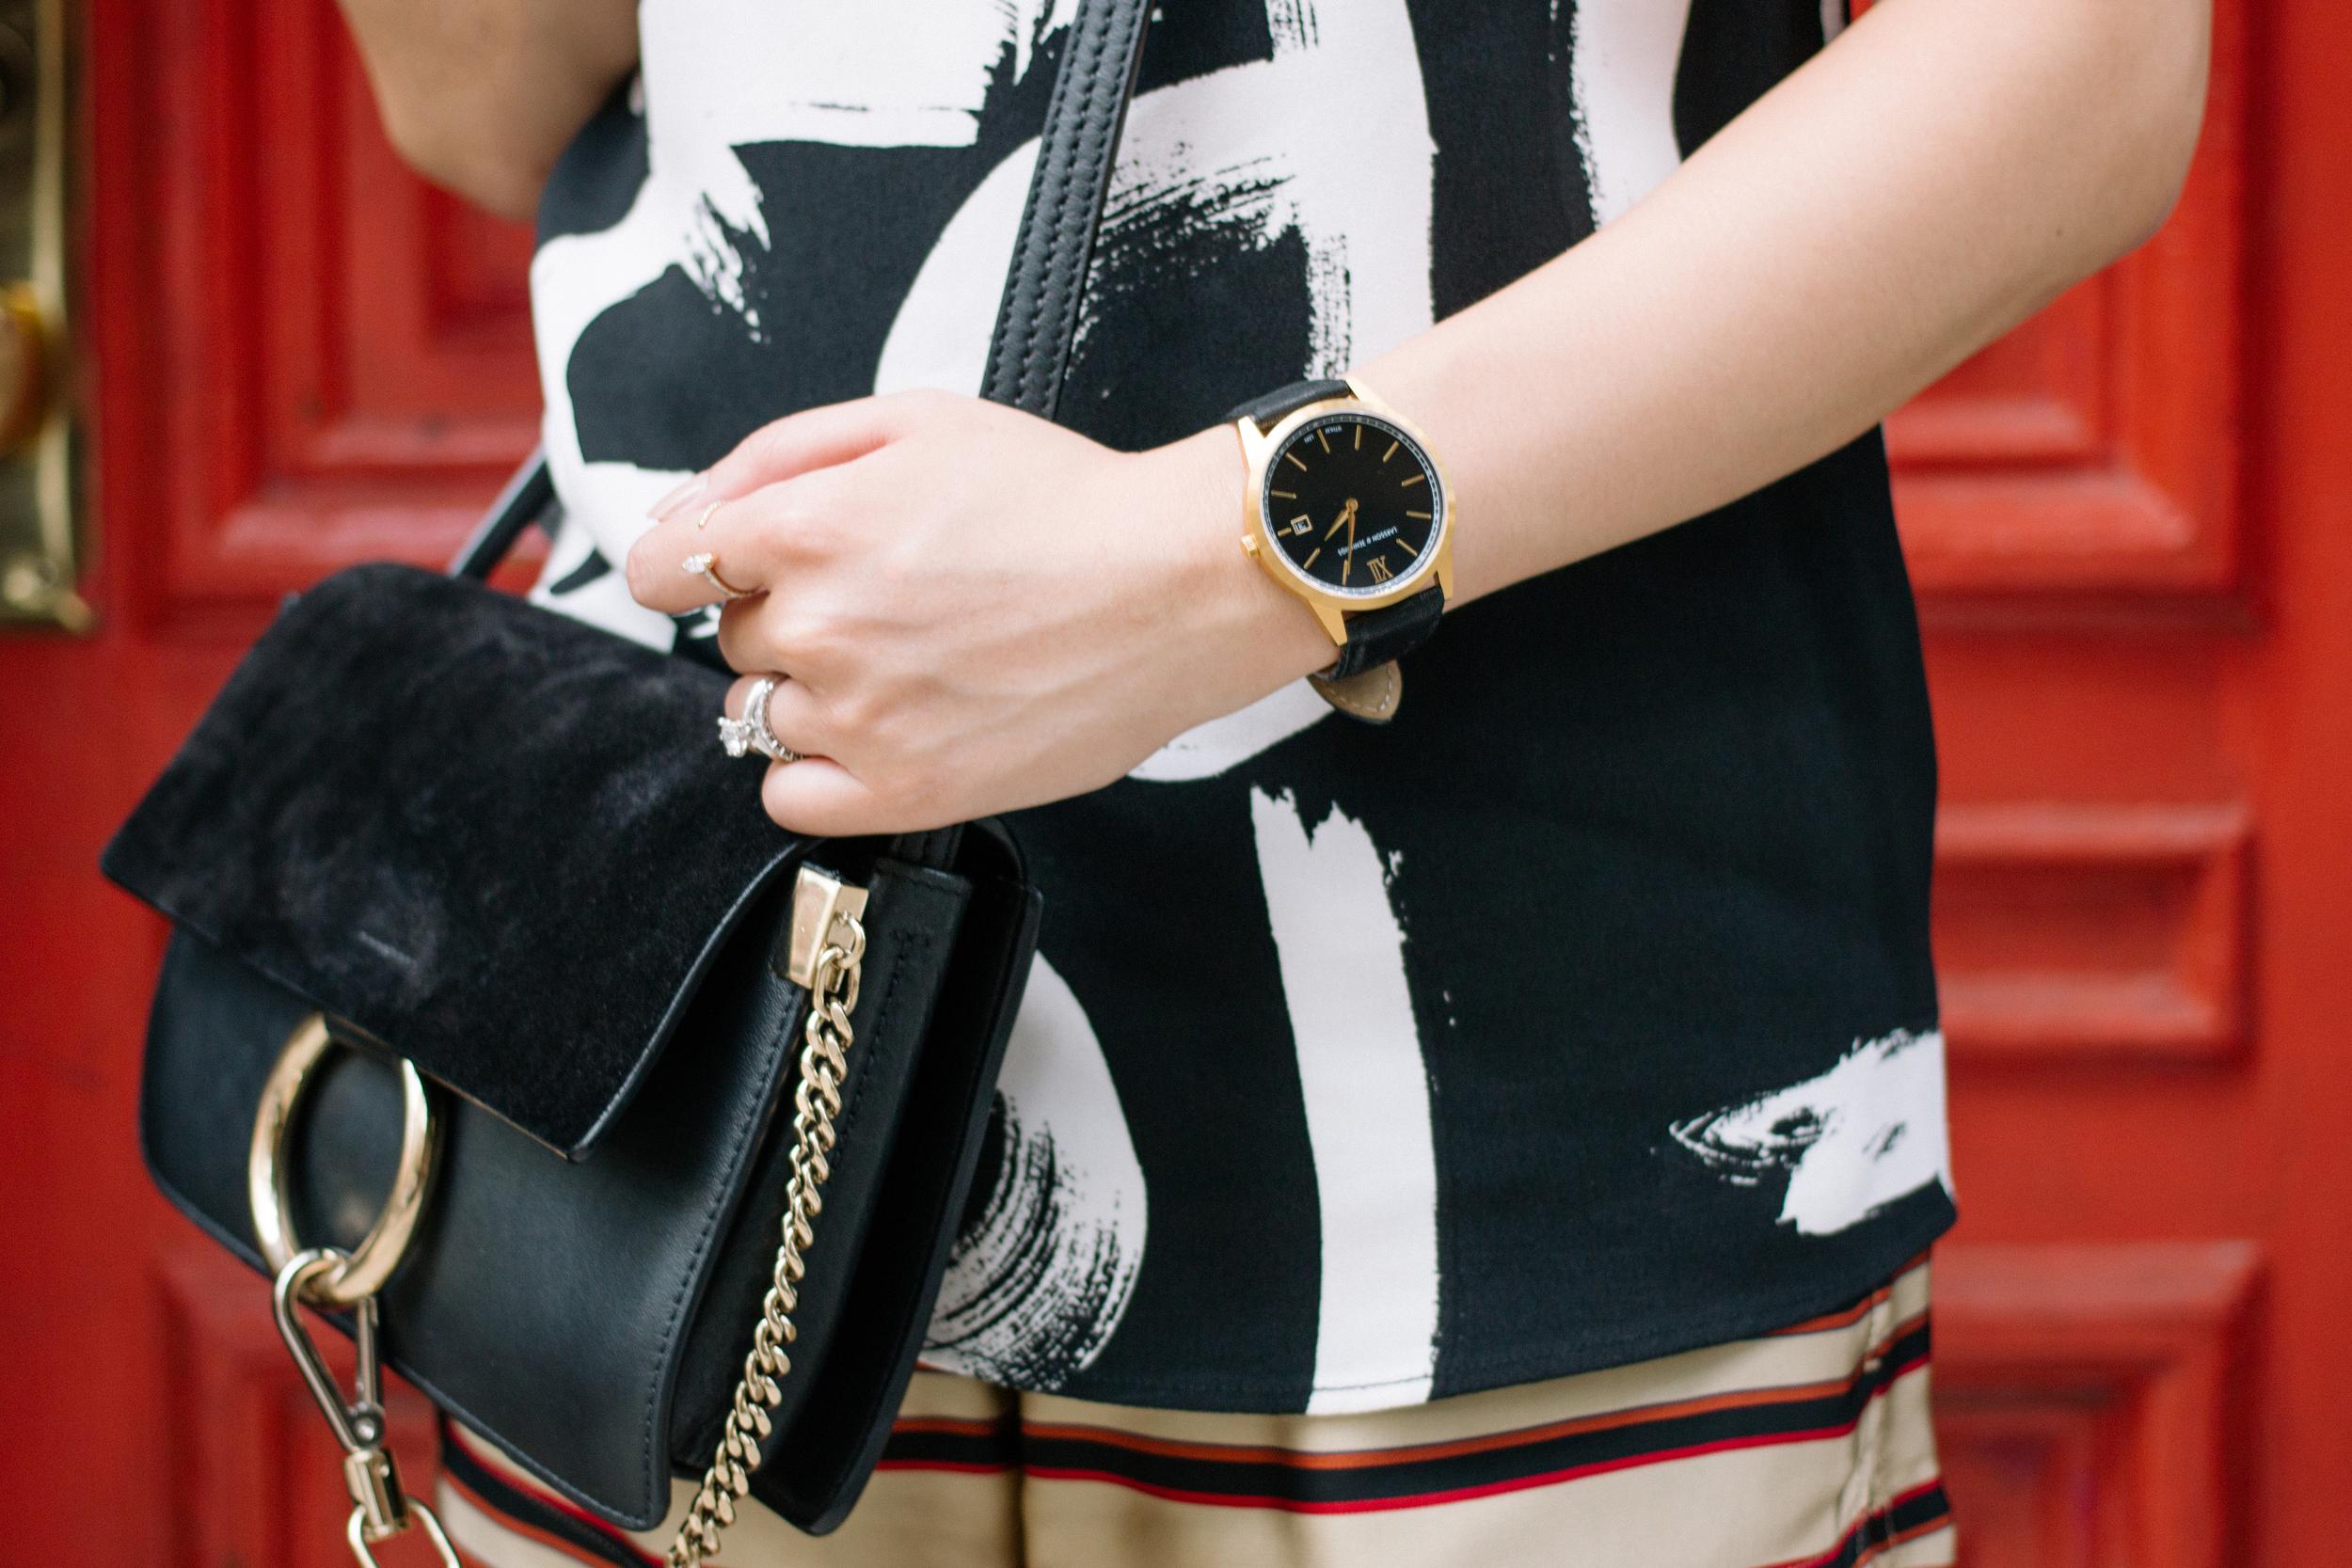 Proenza Schouler Top, Dries Van Noten Shorts,  Chloé Bag ,  Larsson & Jennings Watch ,  Mirlo Jewelry